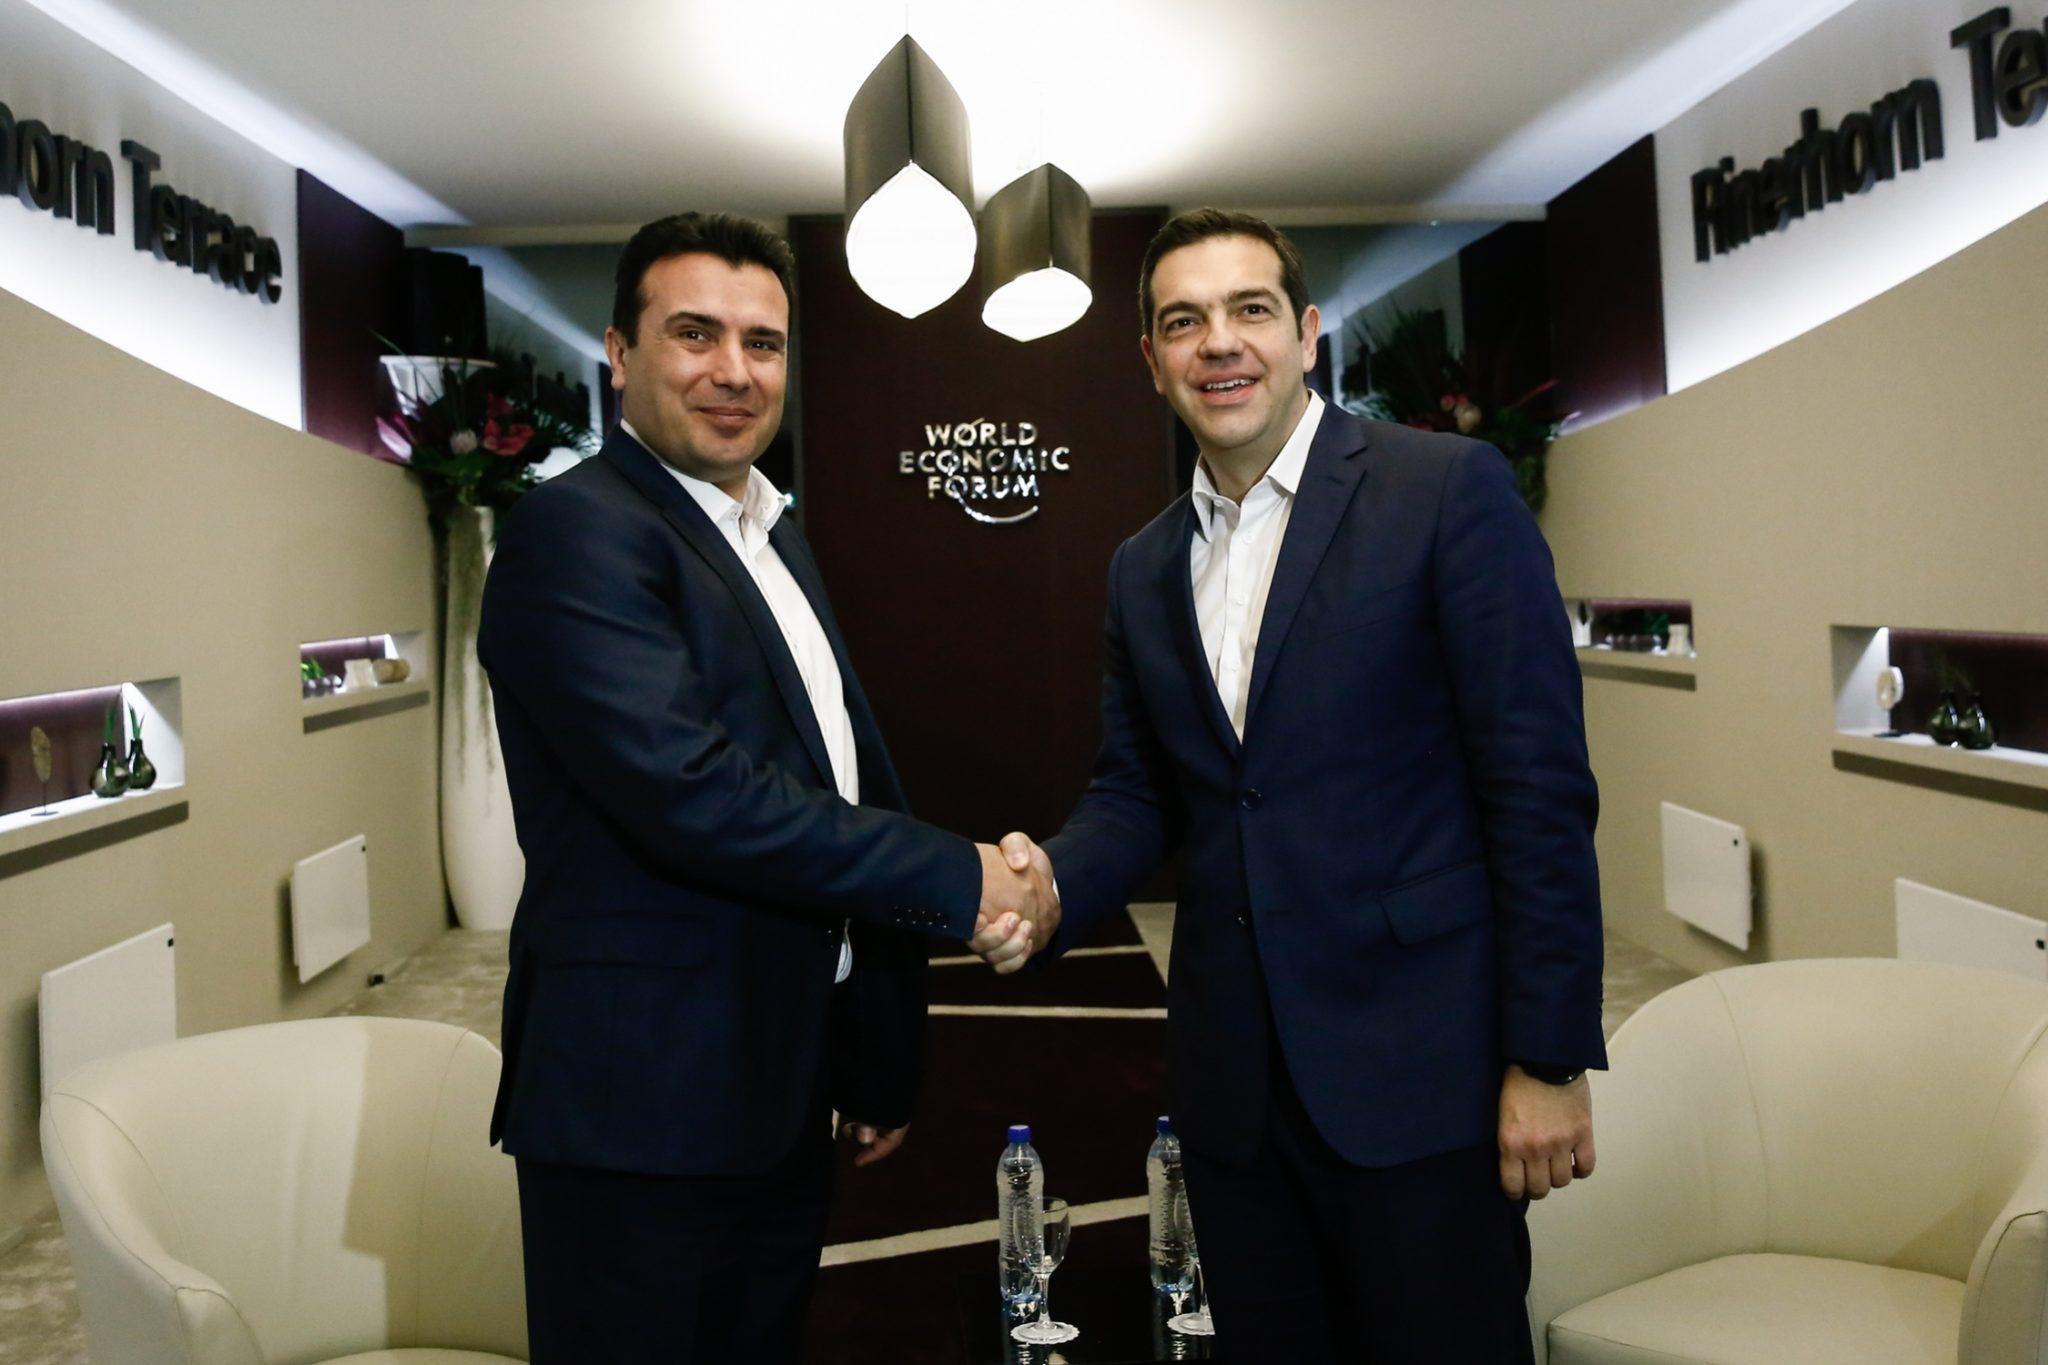 Aναβρασμός στο πολιτικό σκηνικό με αιχμή τη συμφωνία με τη FYROM | to10.gr